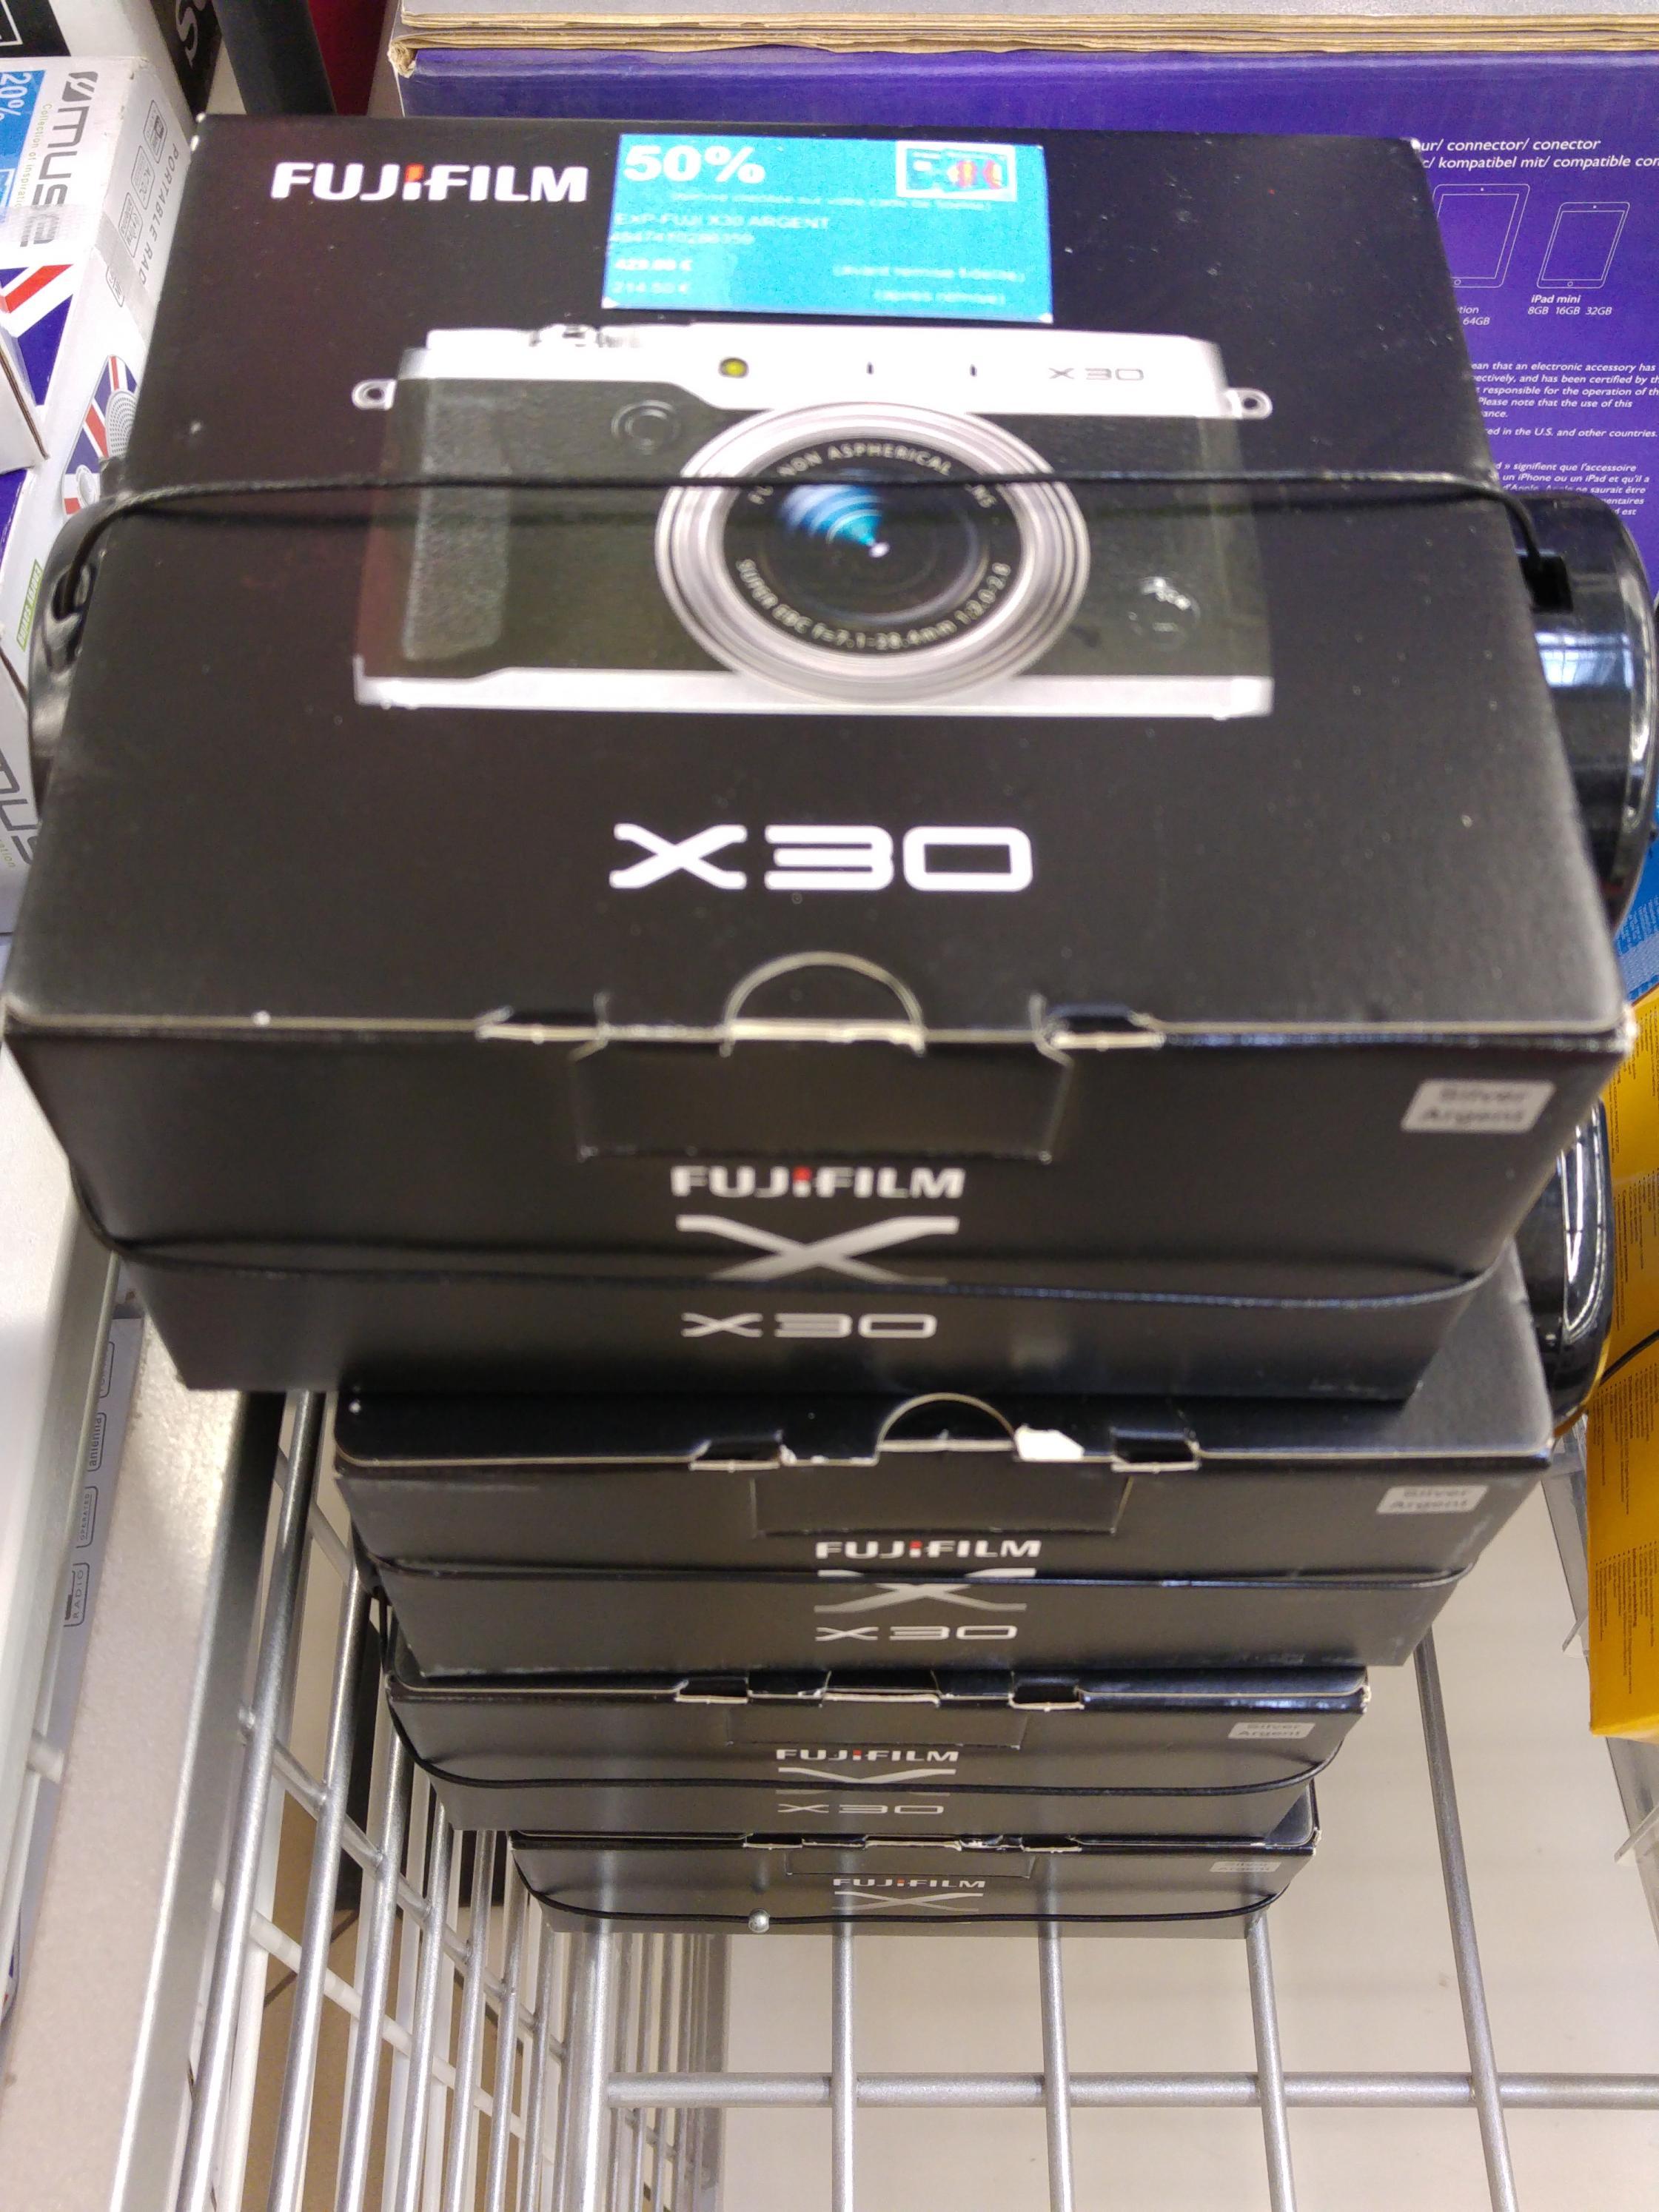 Compact Fujifilm X30 (avec 50% sur la carte)